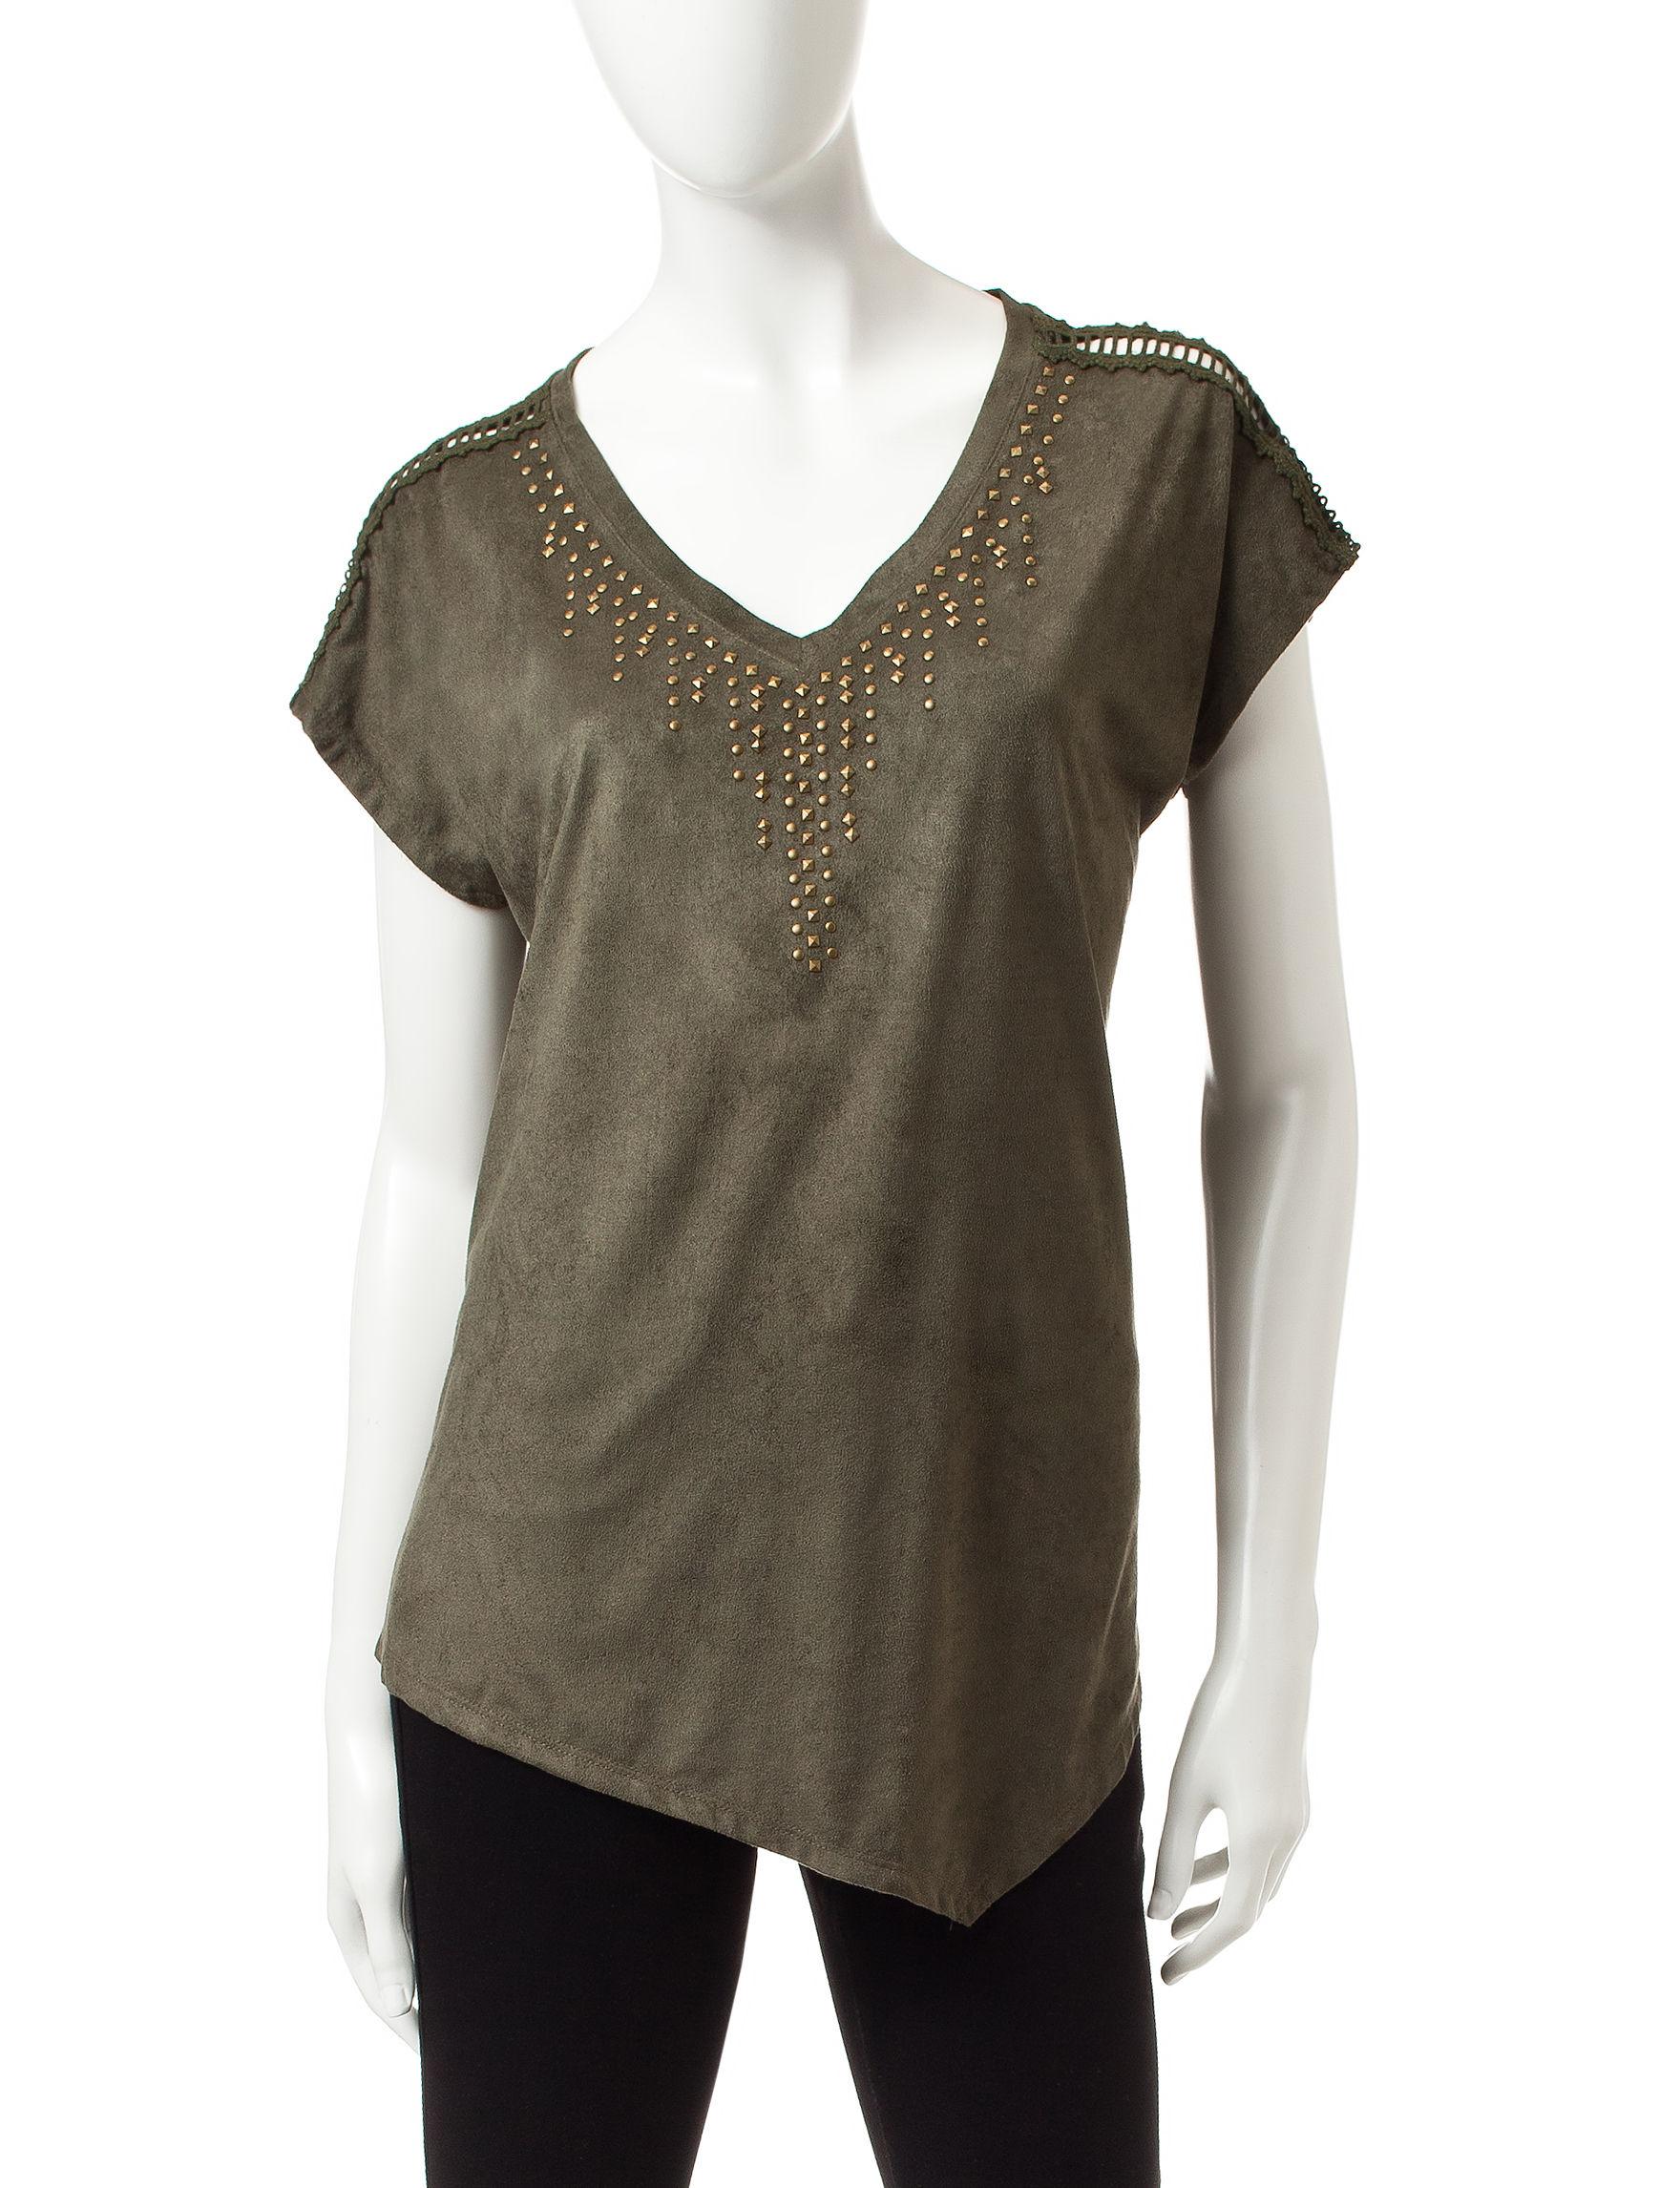 Signature Studio Olive Shirts & Blouses